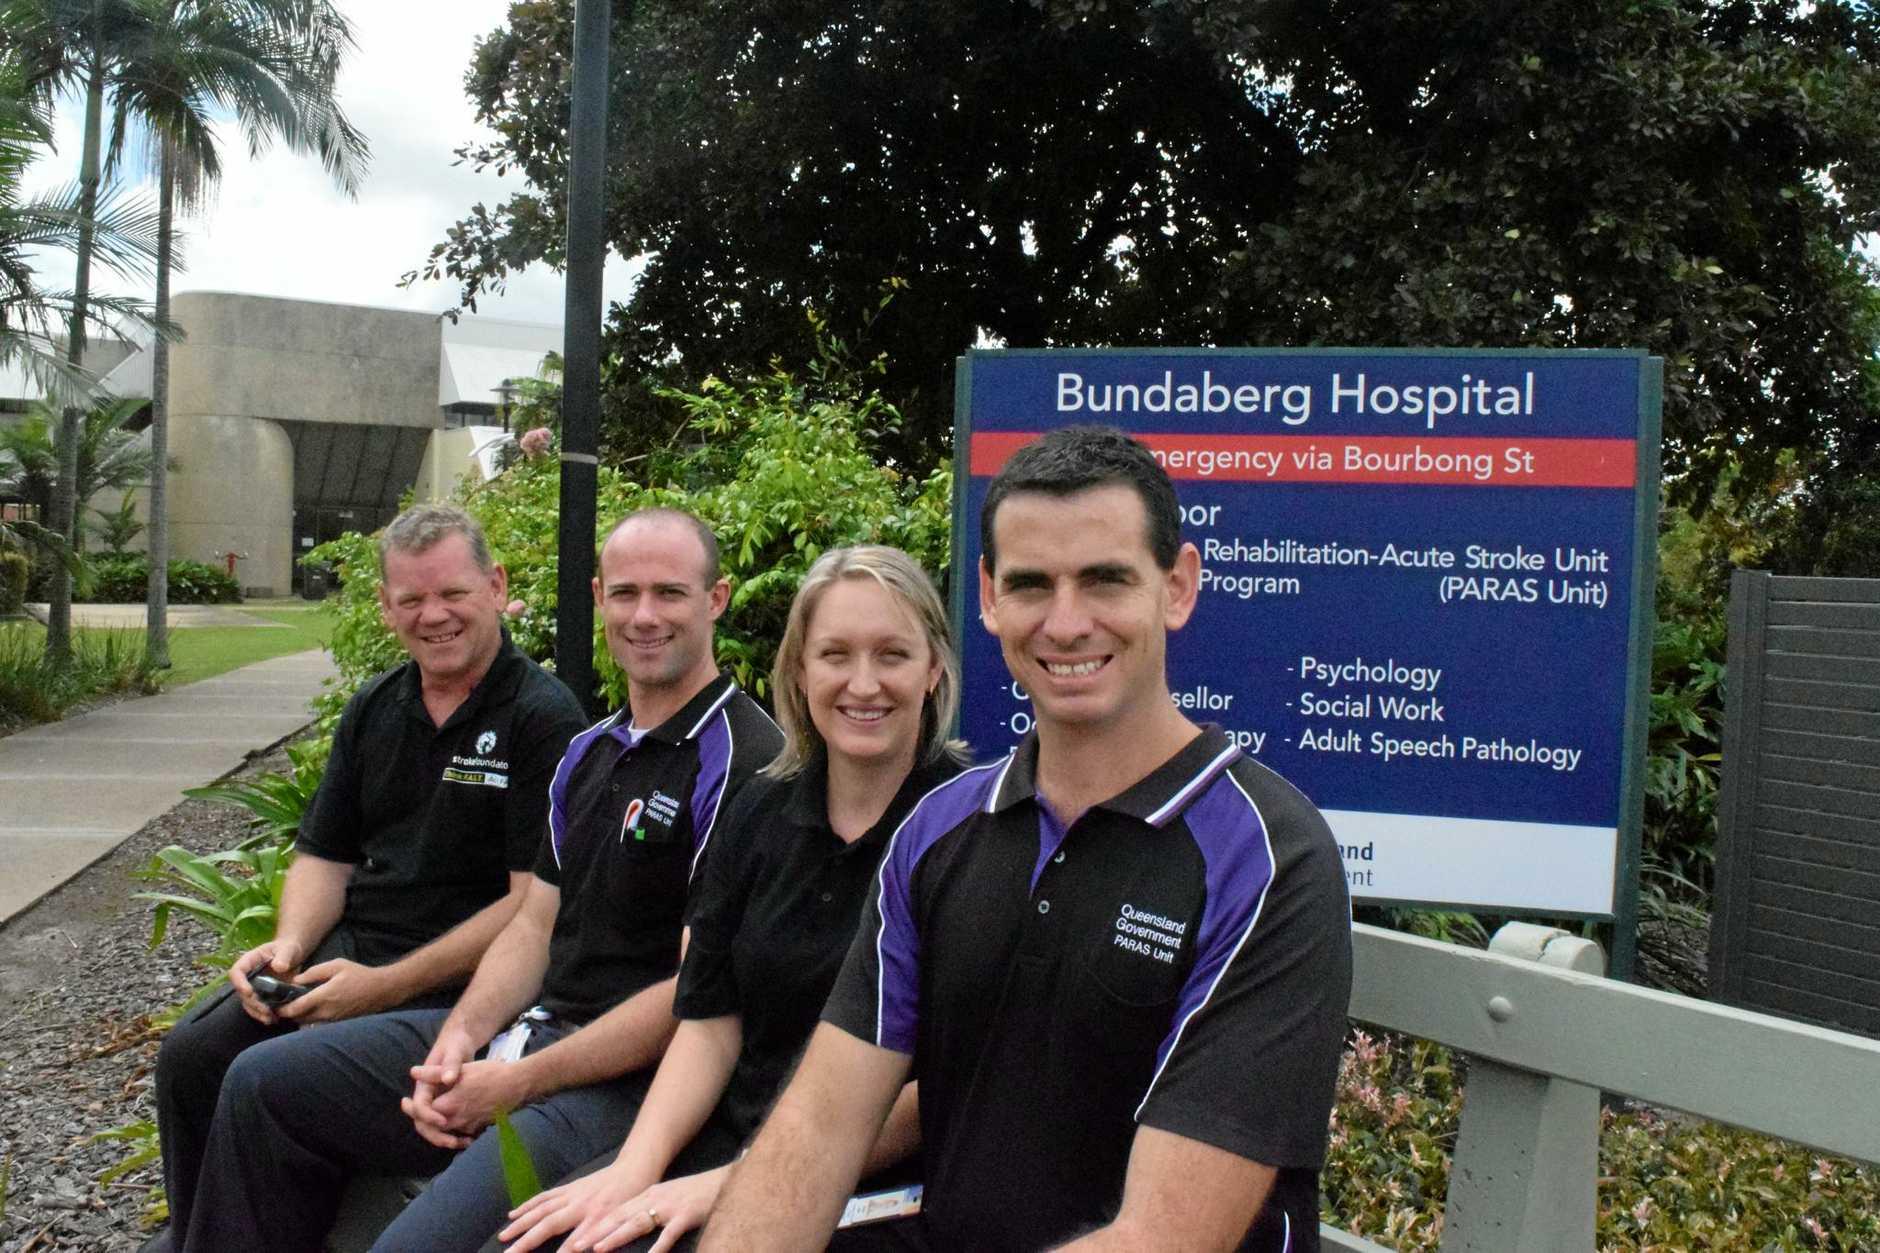 ROLE MODELS: Bundaberg Hospital PARAS Unit's Robert Scott, Daniel Somerfield, Ashton Isles and Shane Isles.